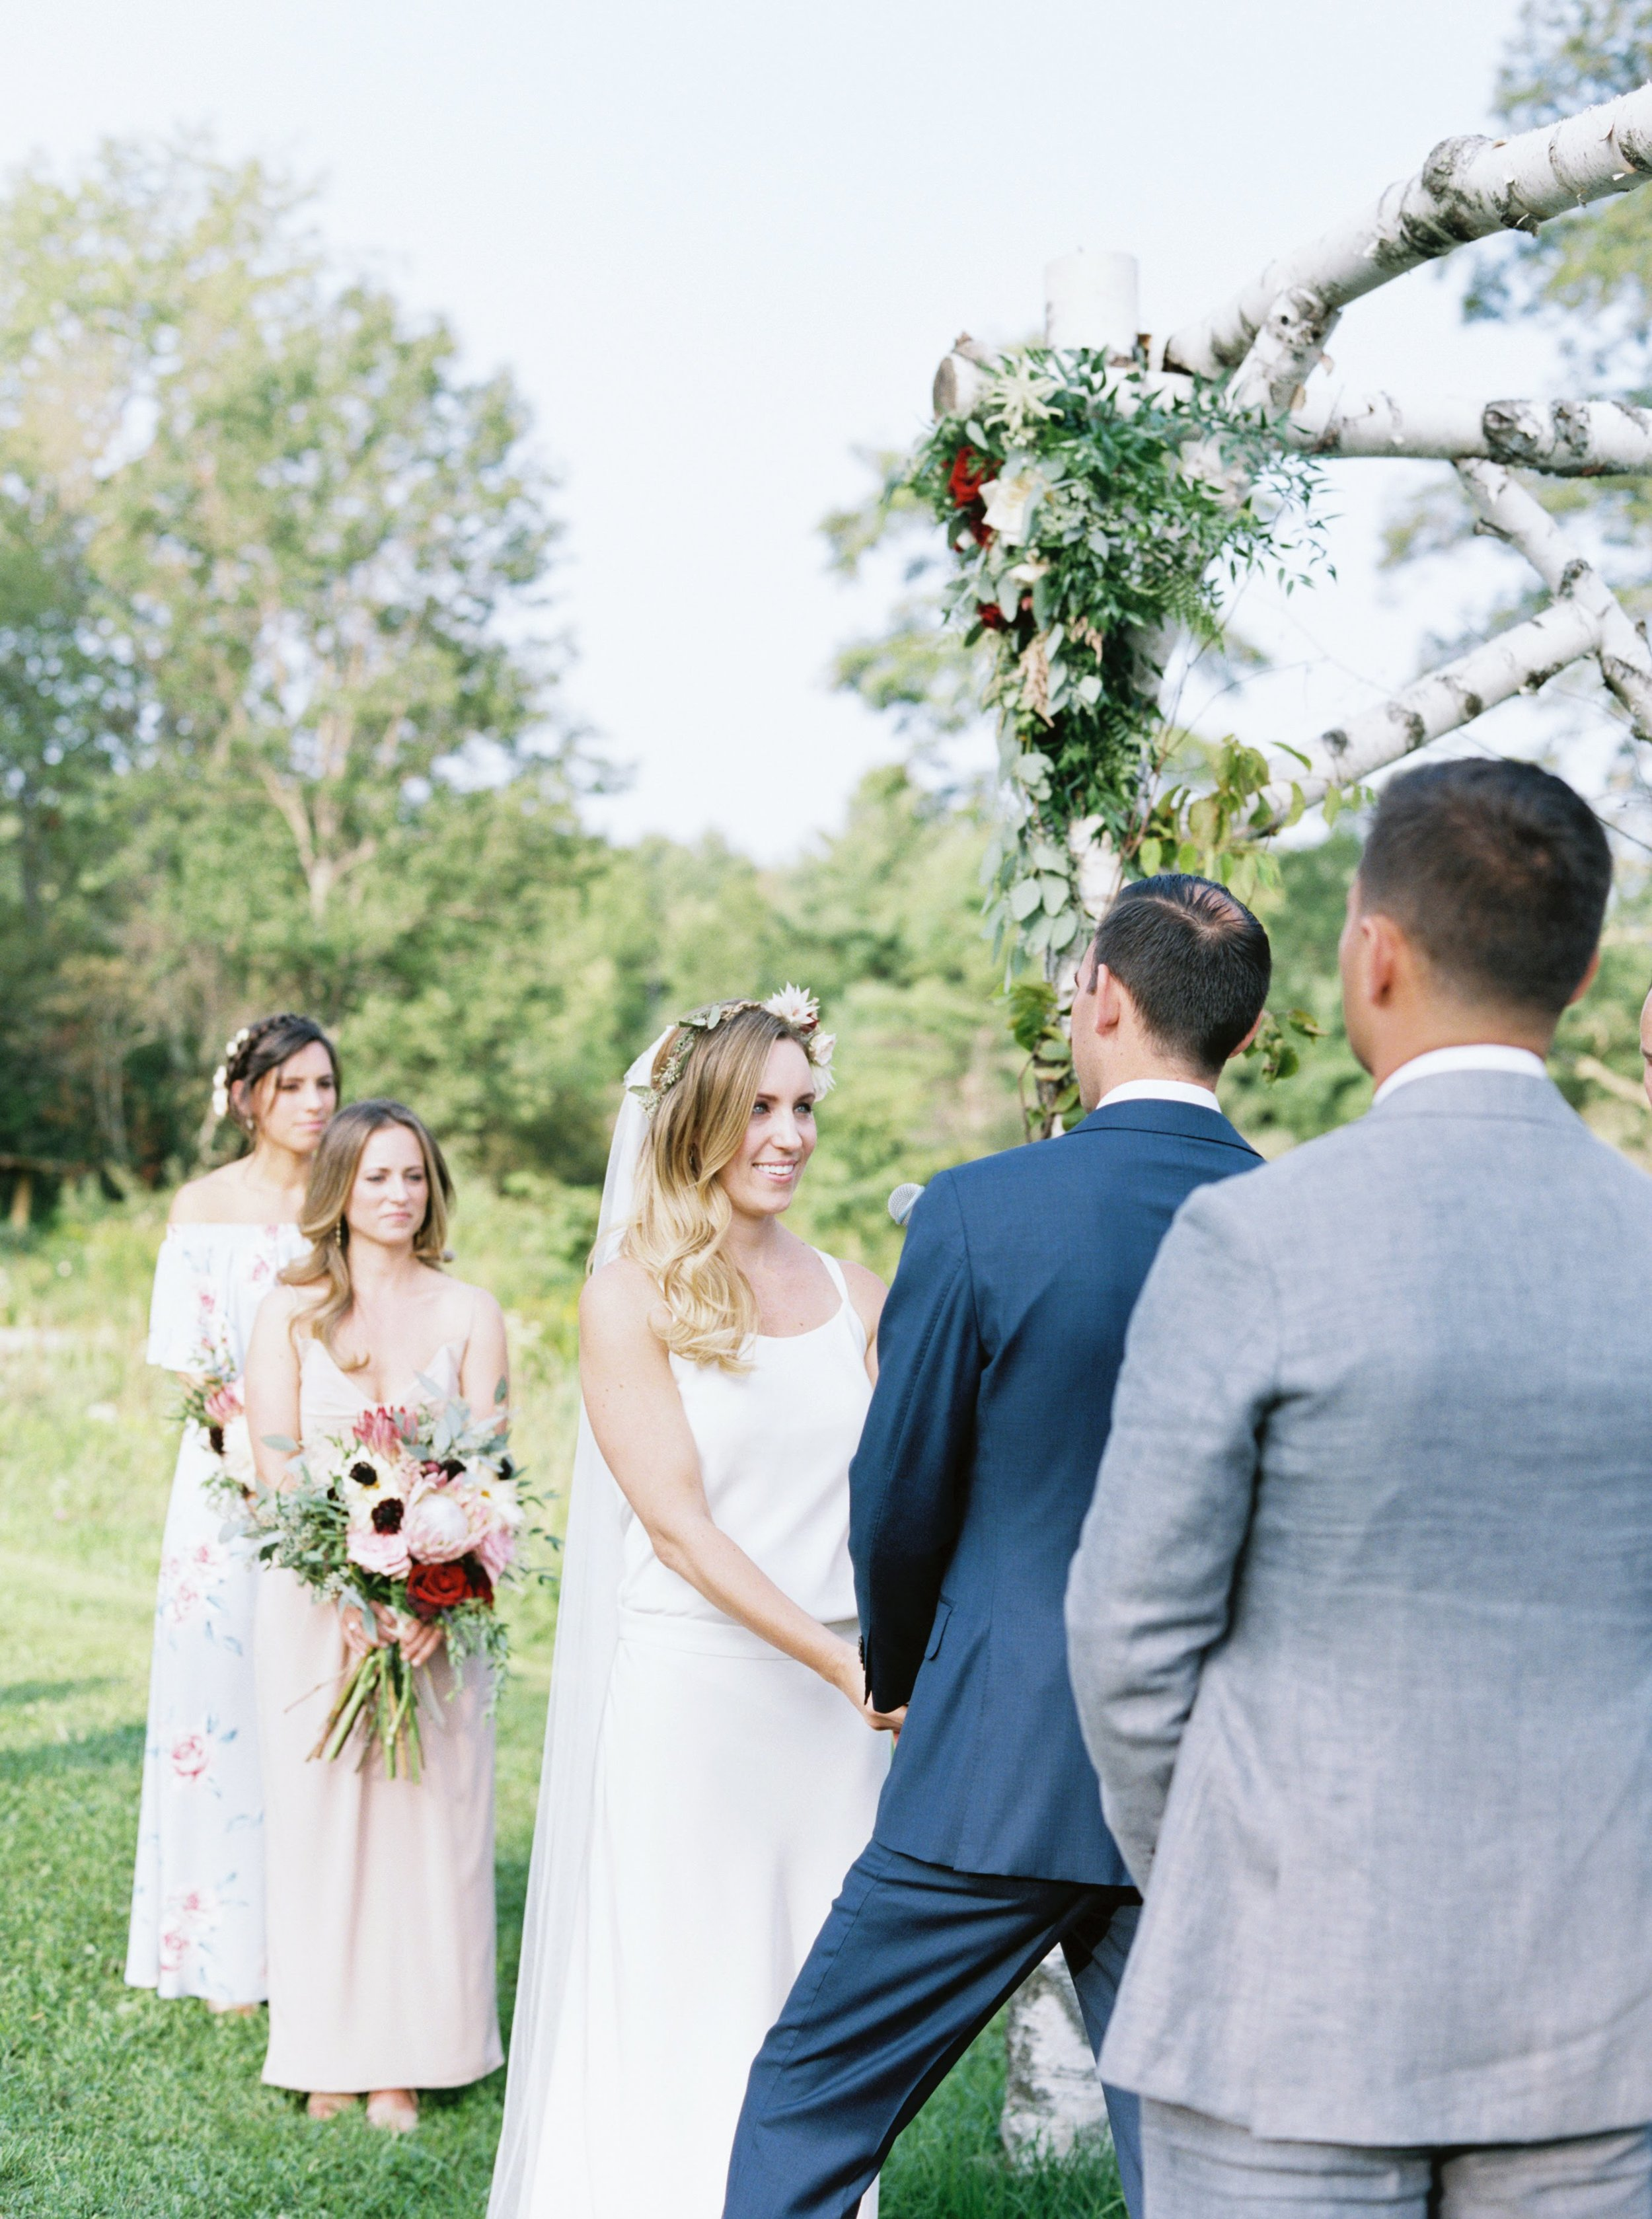 Courtney + Matt Blenheim Hill Farm Catskills NY Wedding Veronica Lola Photography 2017-399.jpg